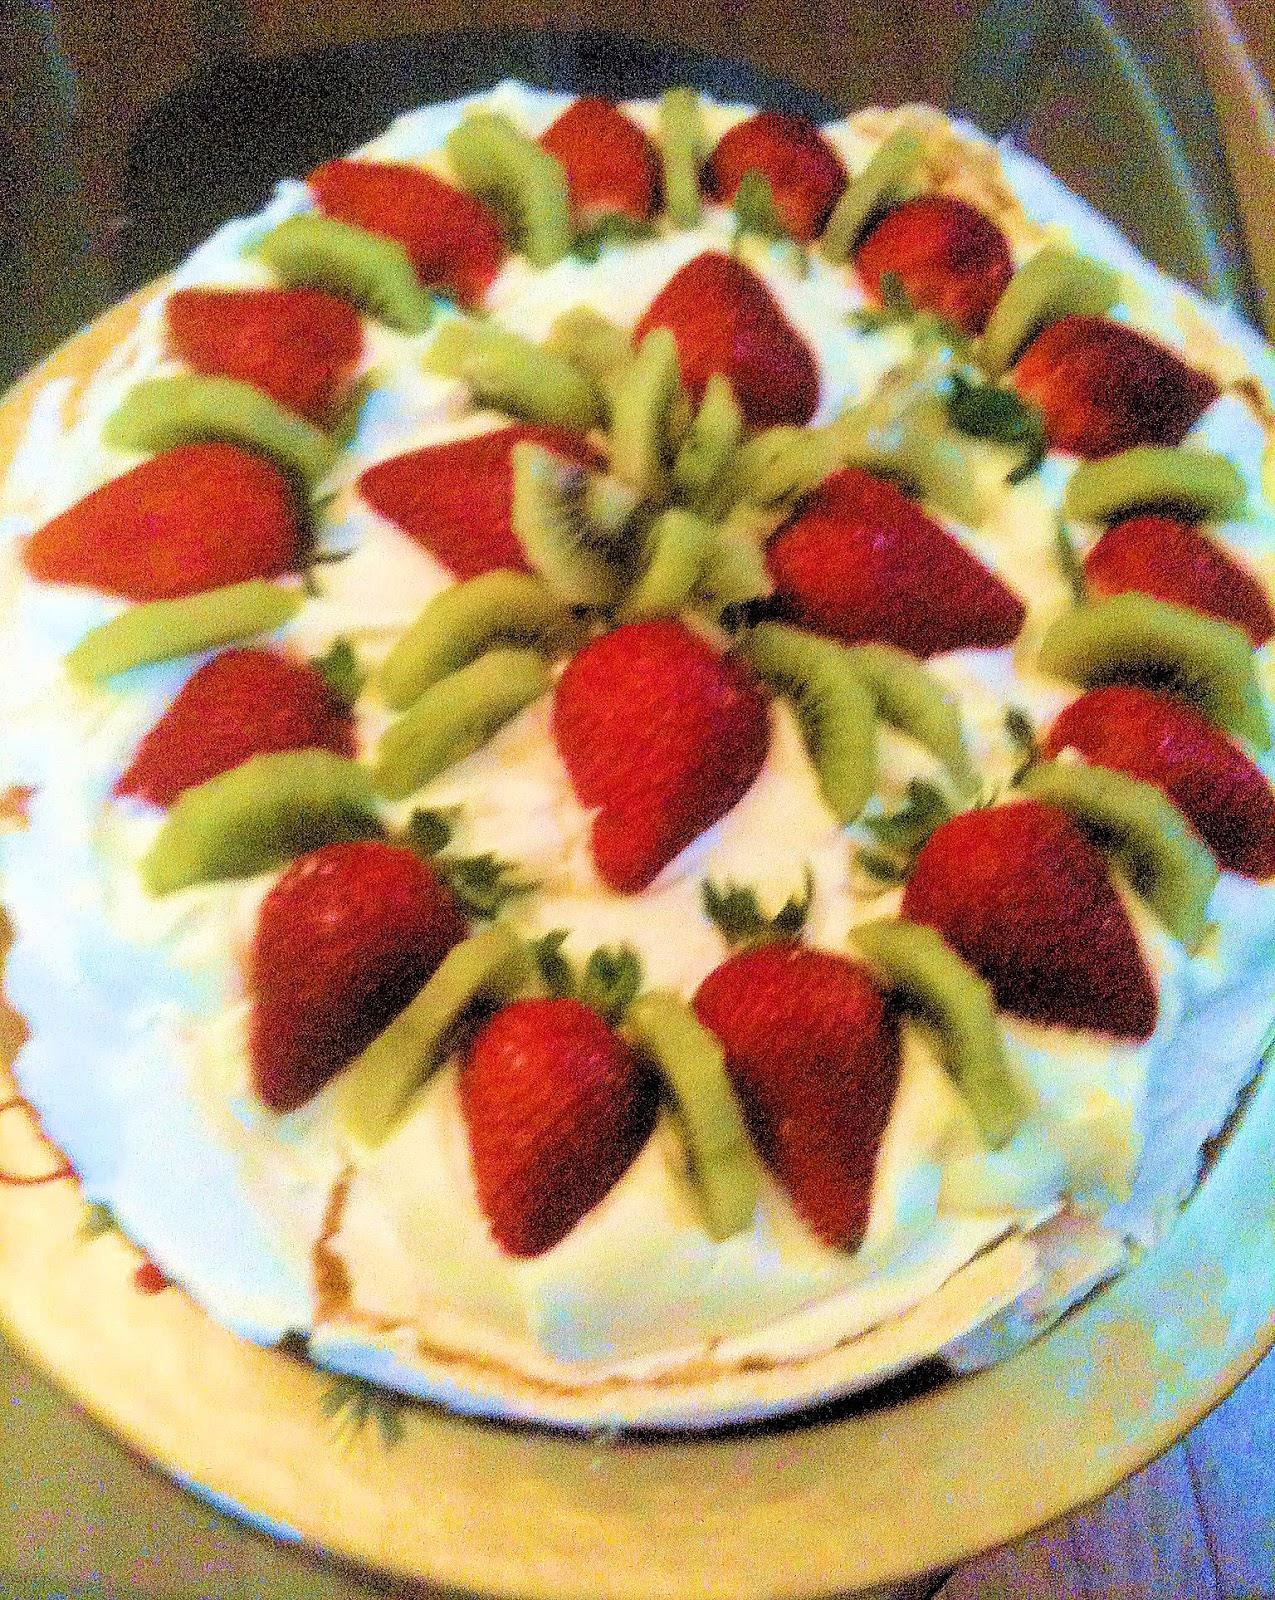 Strawberry Kiwi Pavlovas Recipes — Dishmaps